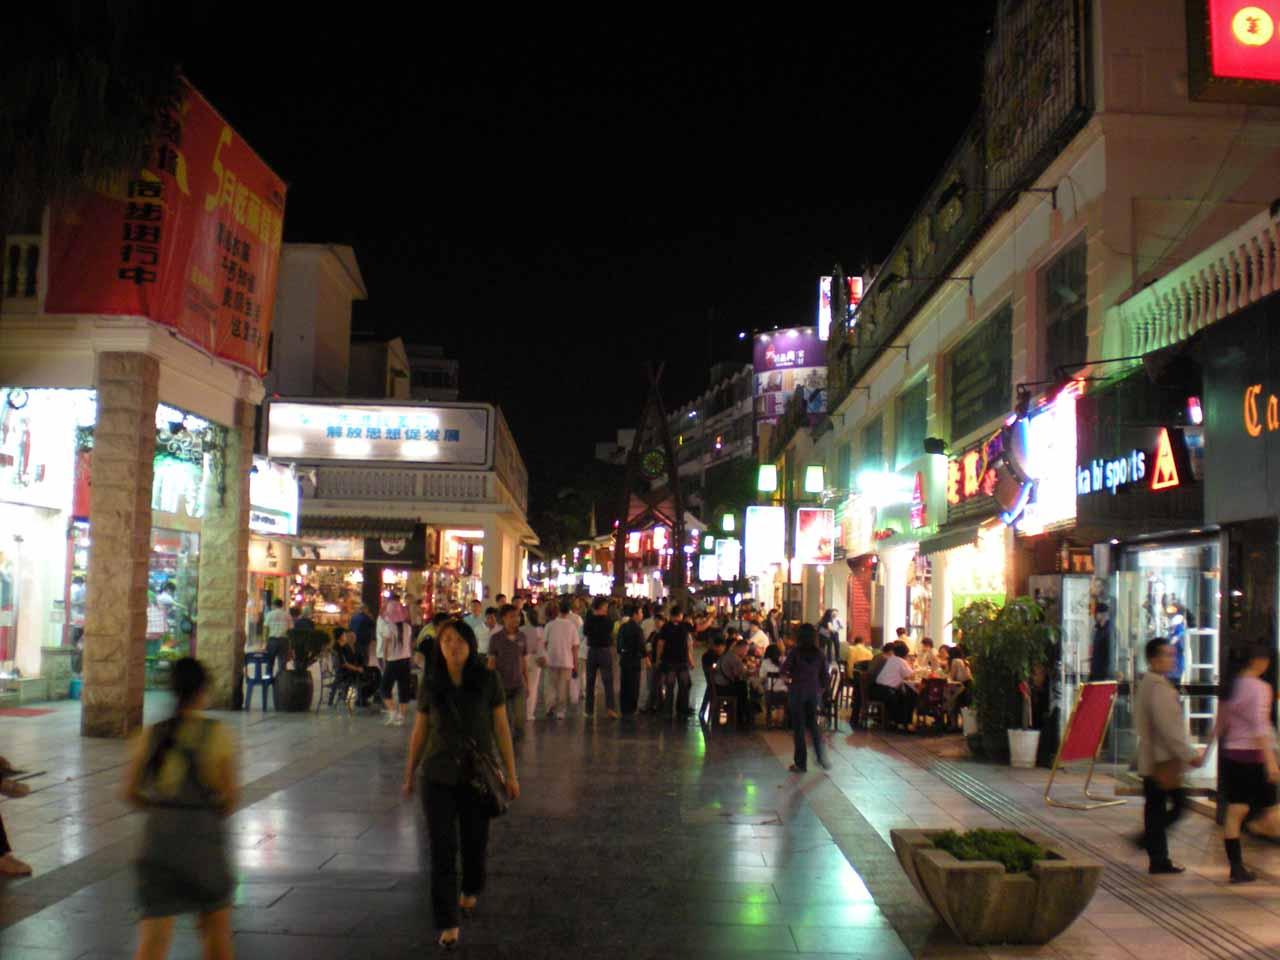 Inside some happening walking street in Guilin